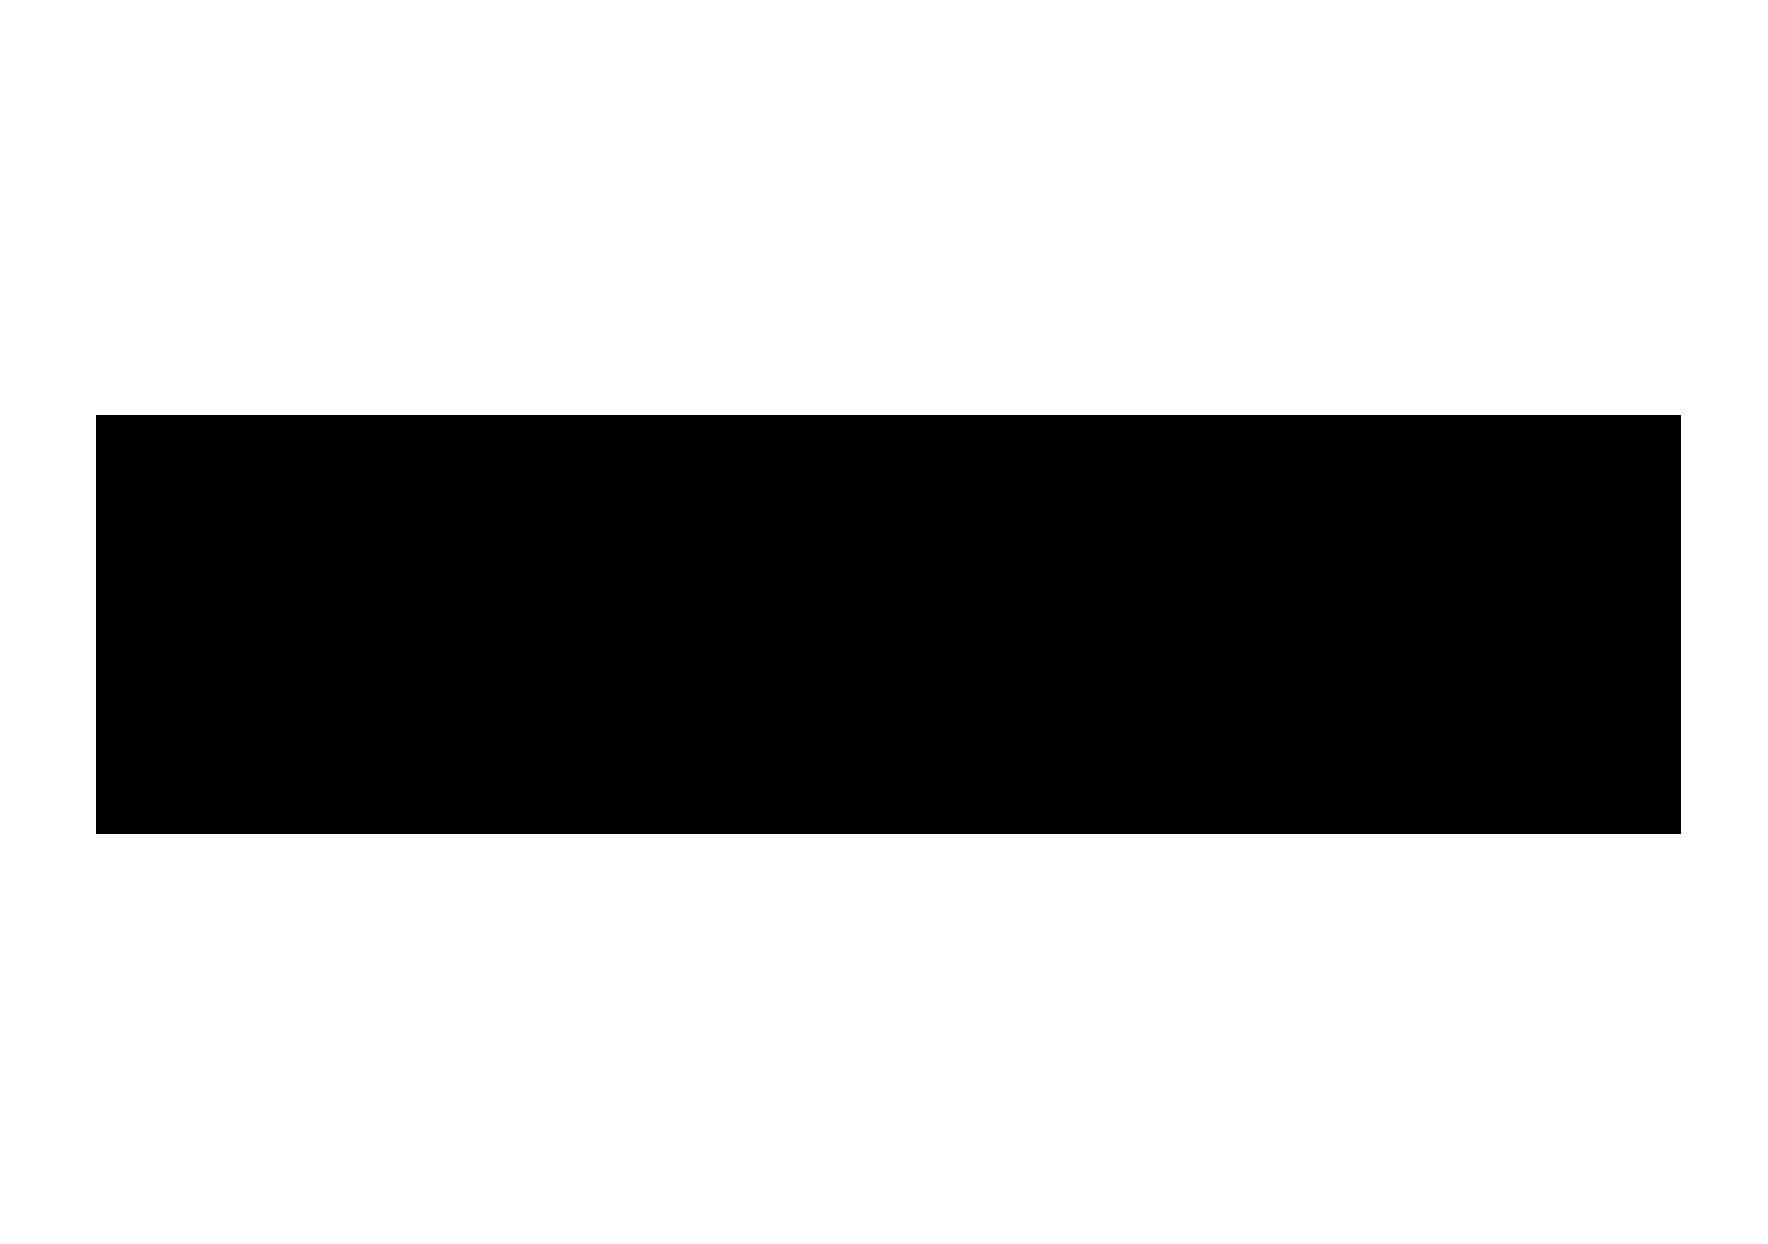 مخطوطه رمضان كريم مفرغه 7 15 مخطوطه لشهر رمضان بالخط الحر png